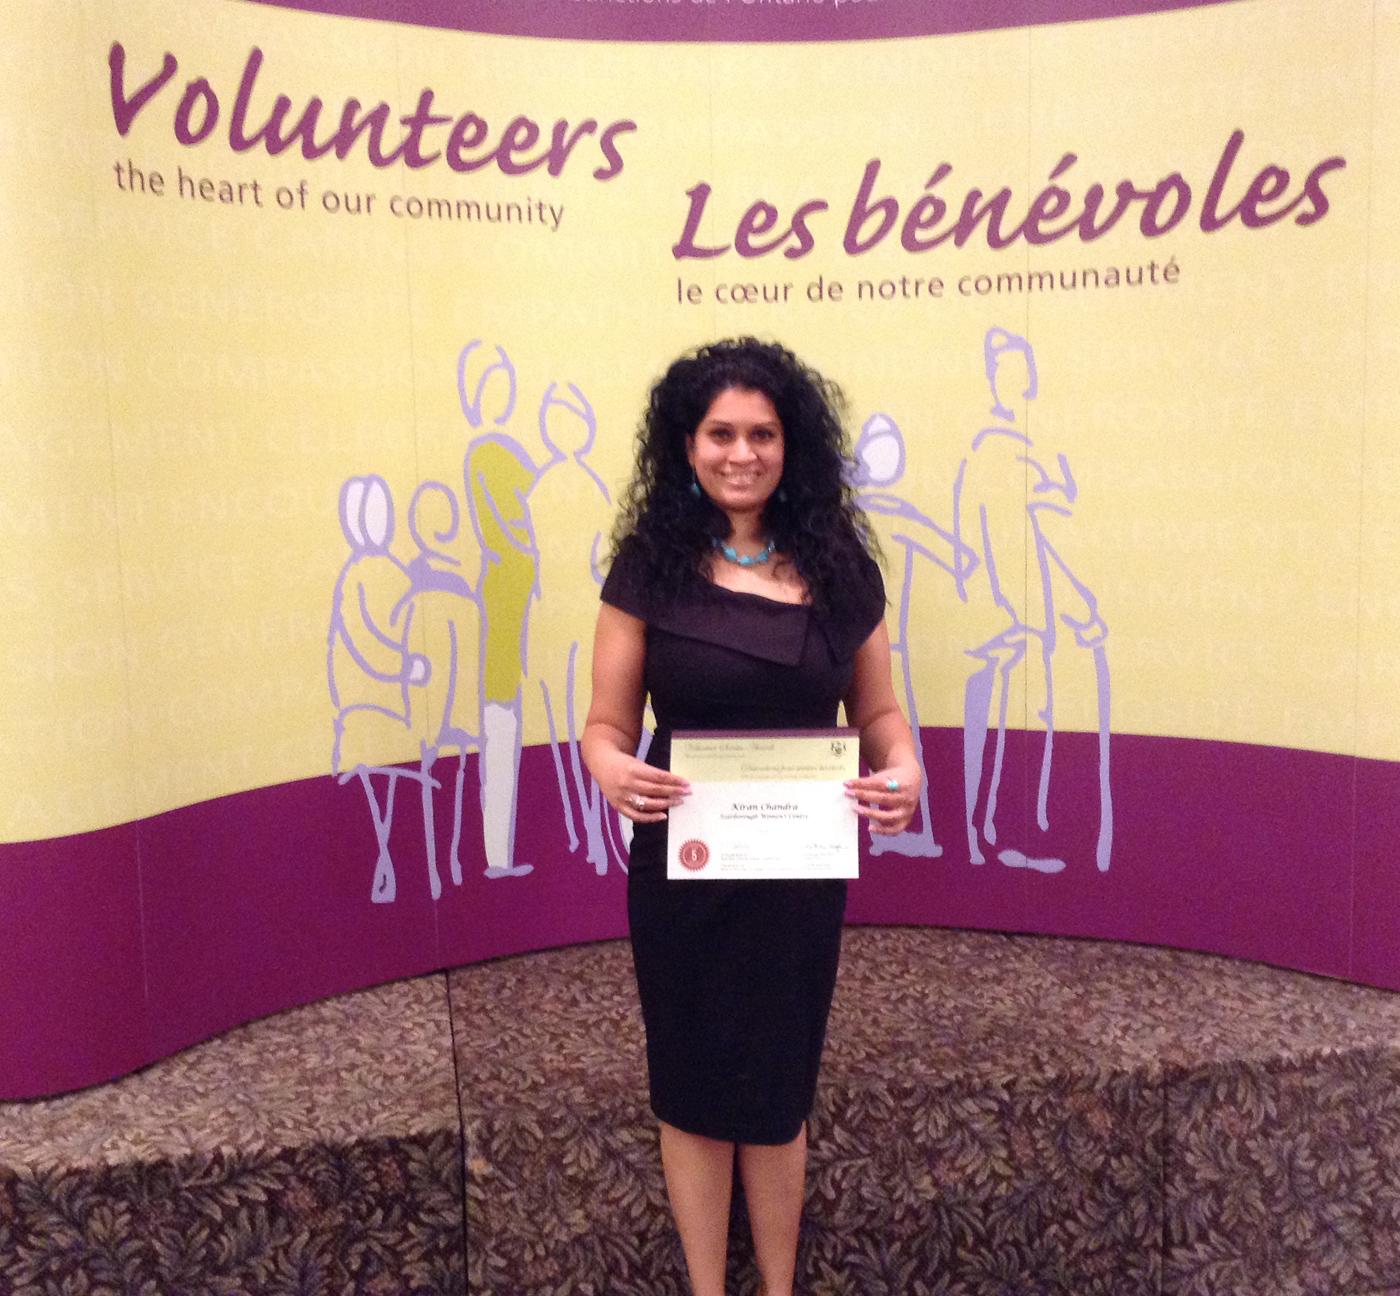 South Asian woman volunteer